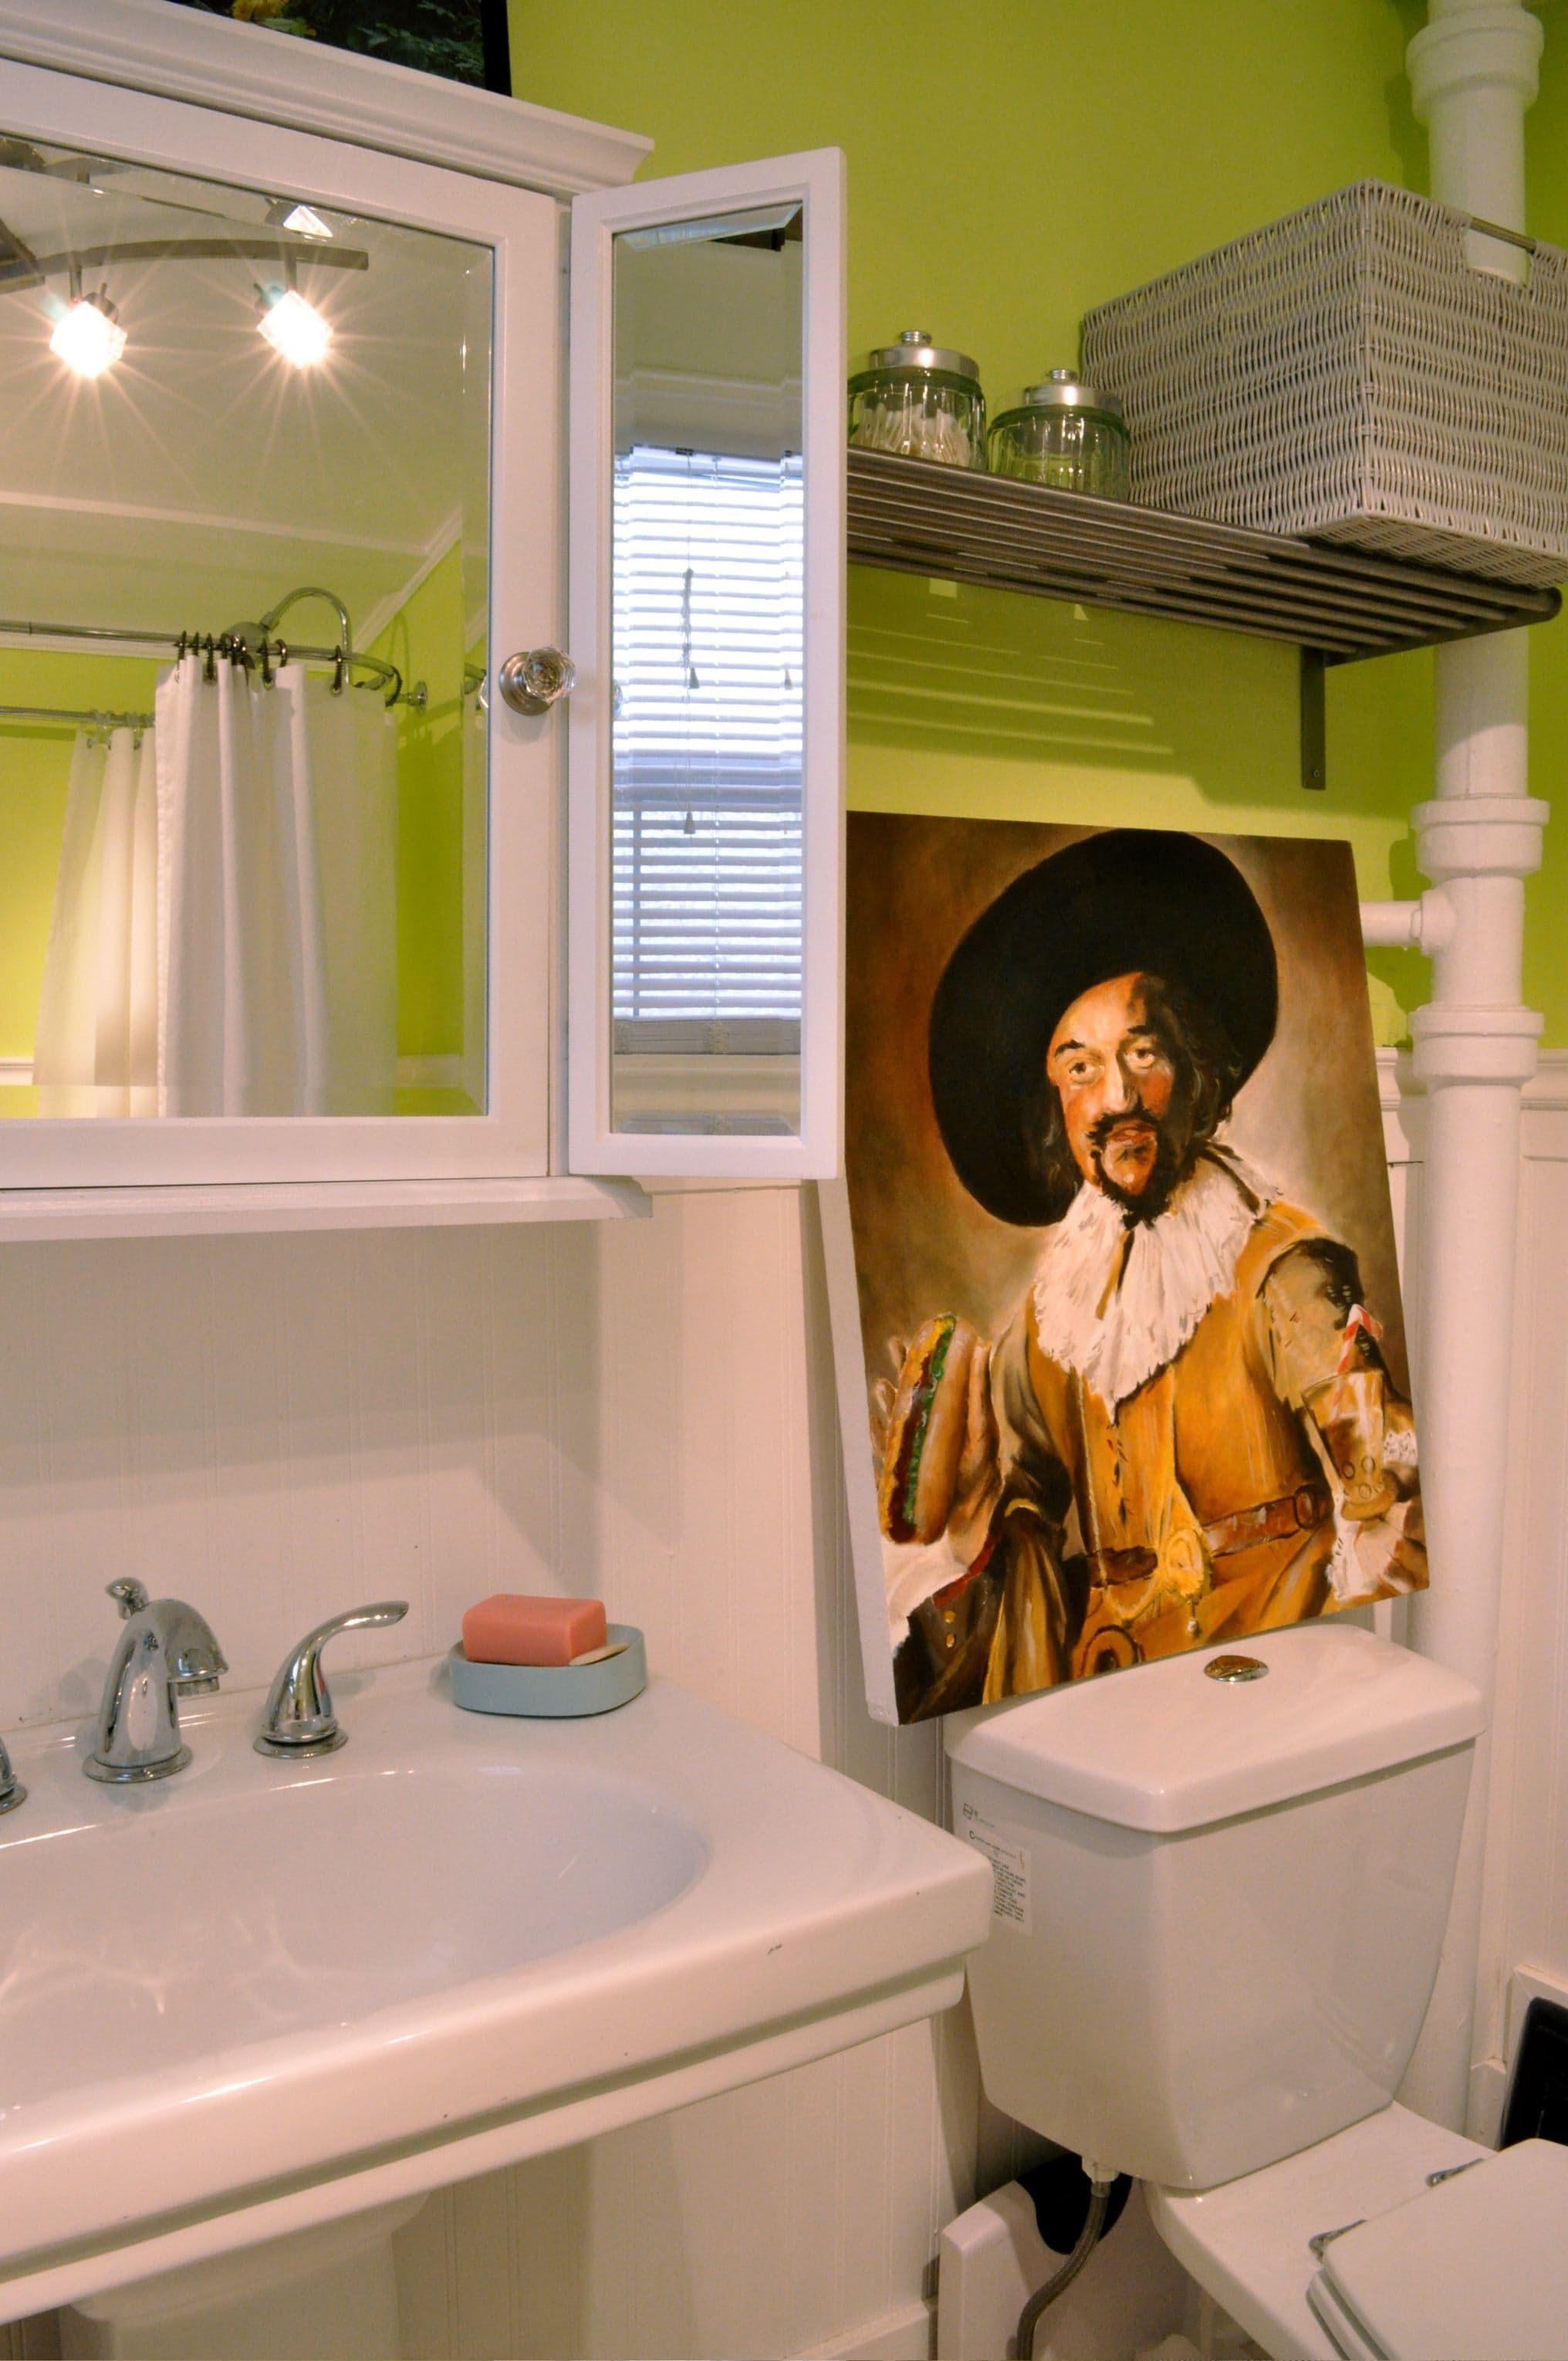 Bright Bathroom, Cool Art